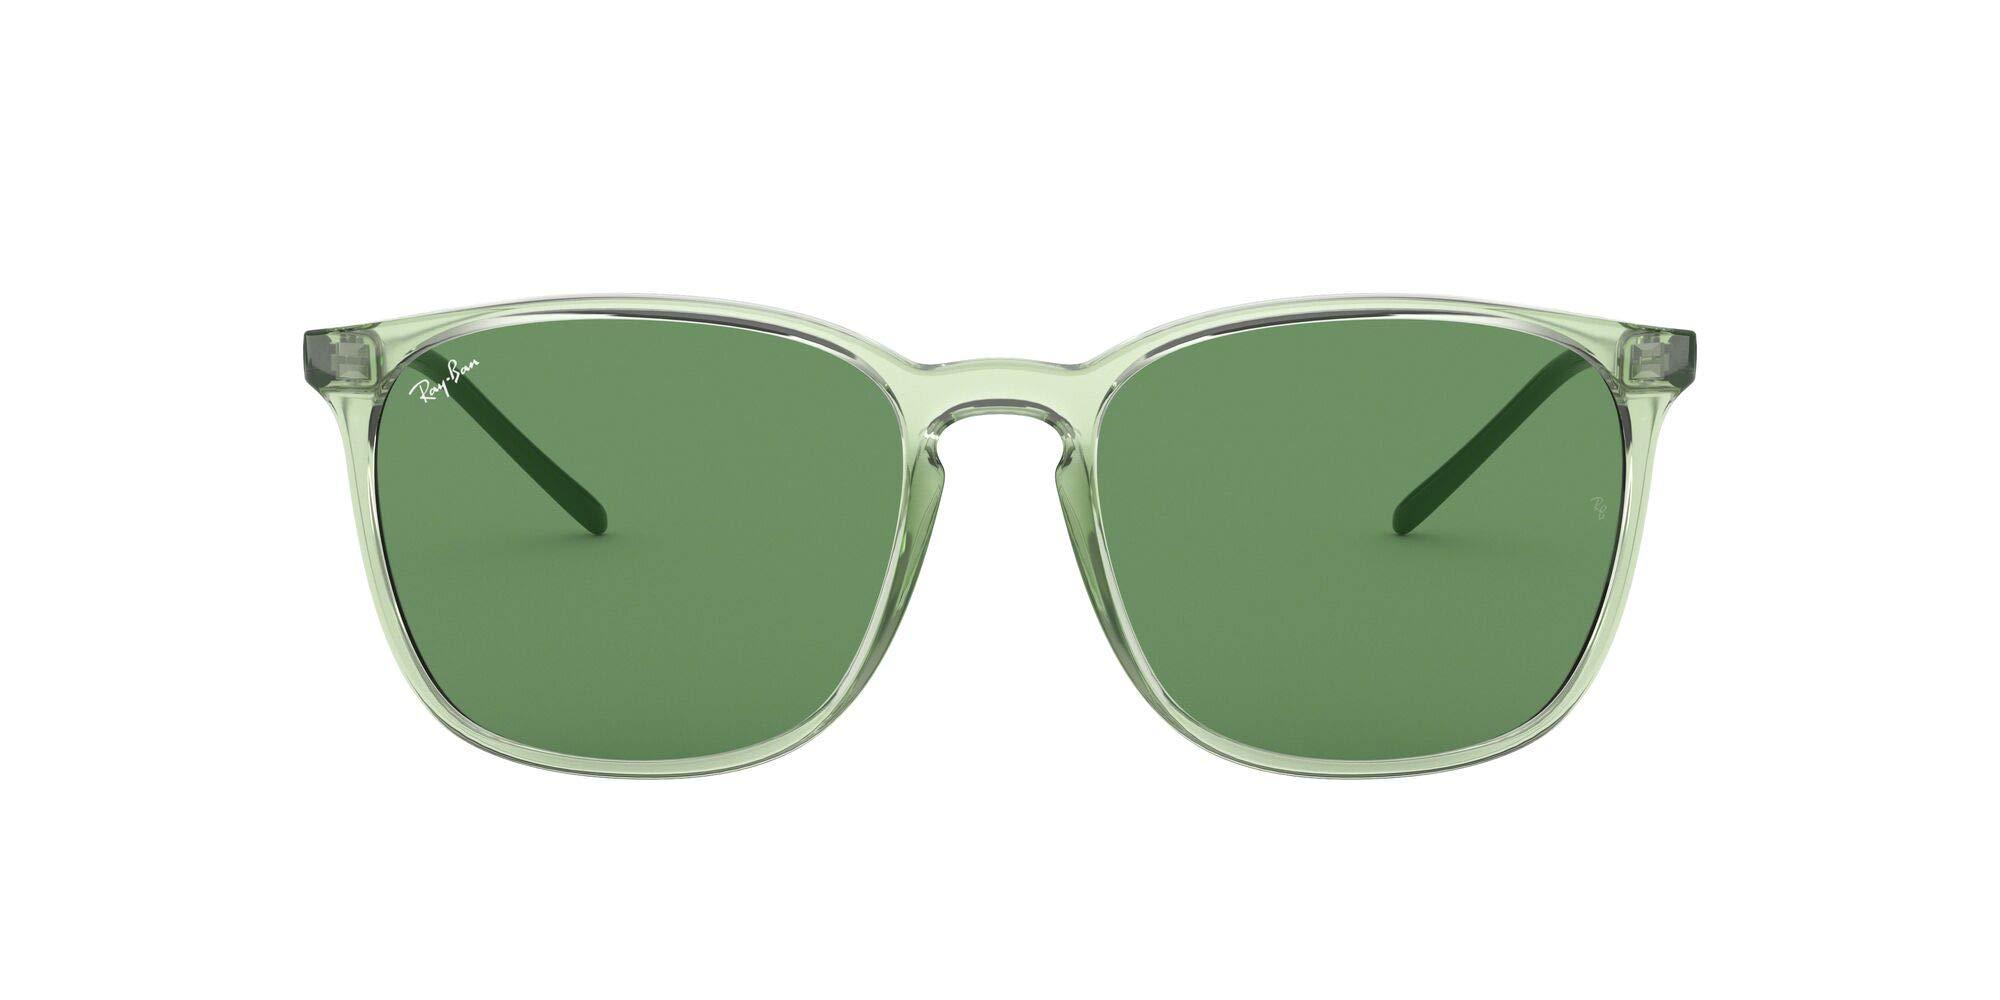 Ray-Ban Men's Rb4387 Round Sunglasses